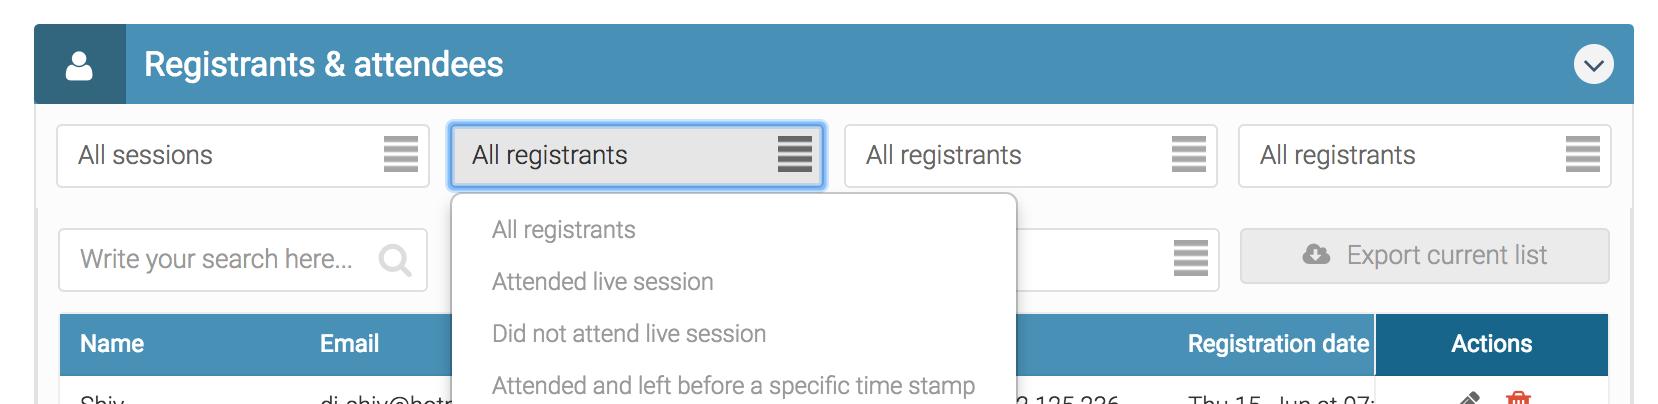 registrants data